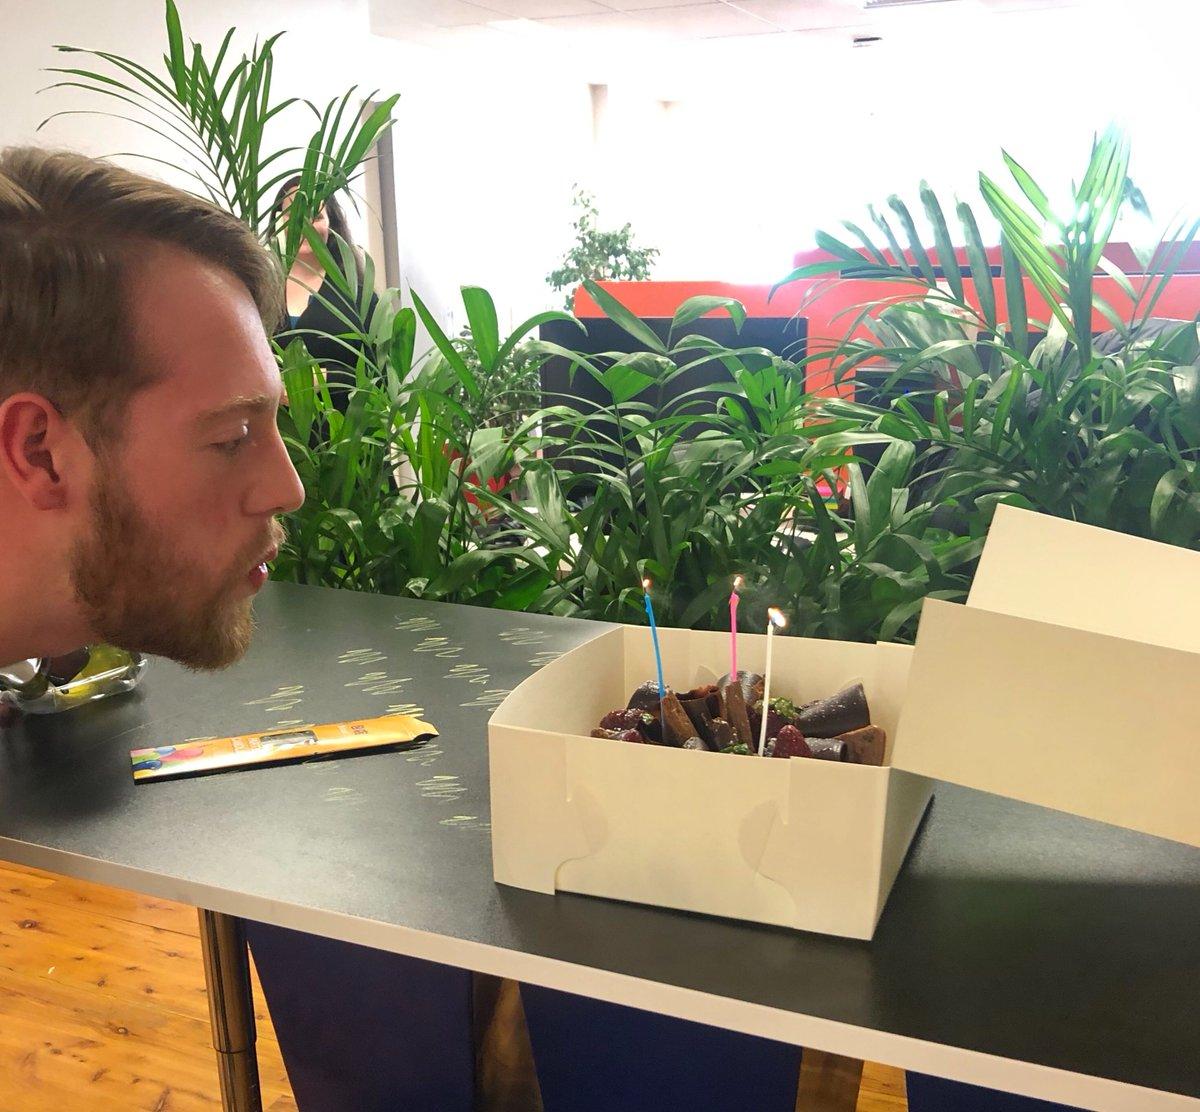 Happy birthday @reilly_francis! Celebrating with a Tim Tam delight from @dobinsonsbakery  #celebration #birthdayboy #happybirthday #fifthdomain #wearefamily #cake #timtam #cyber #startup #training #education #chocolate